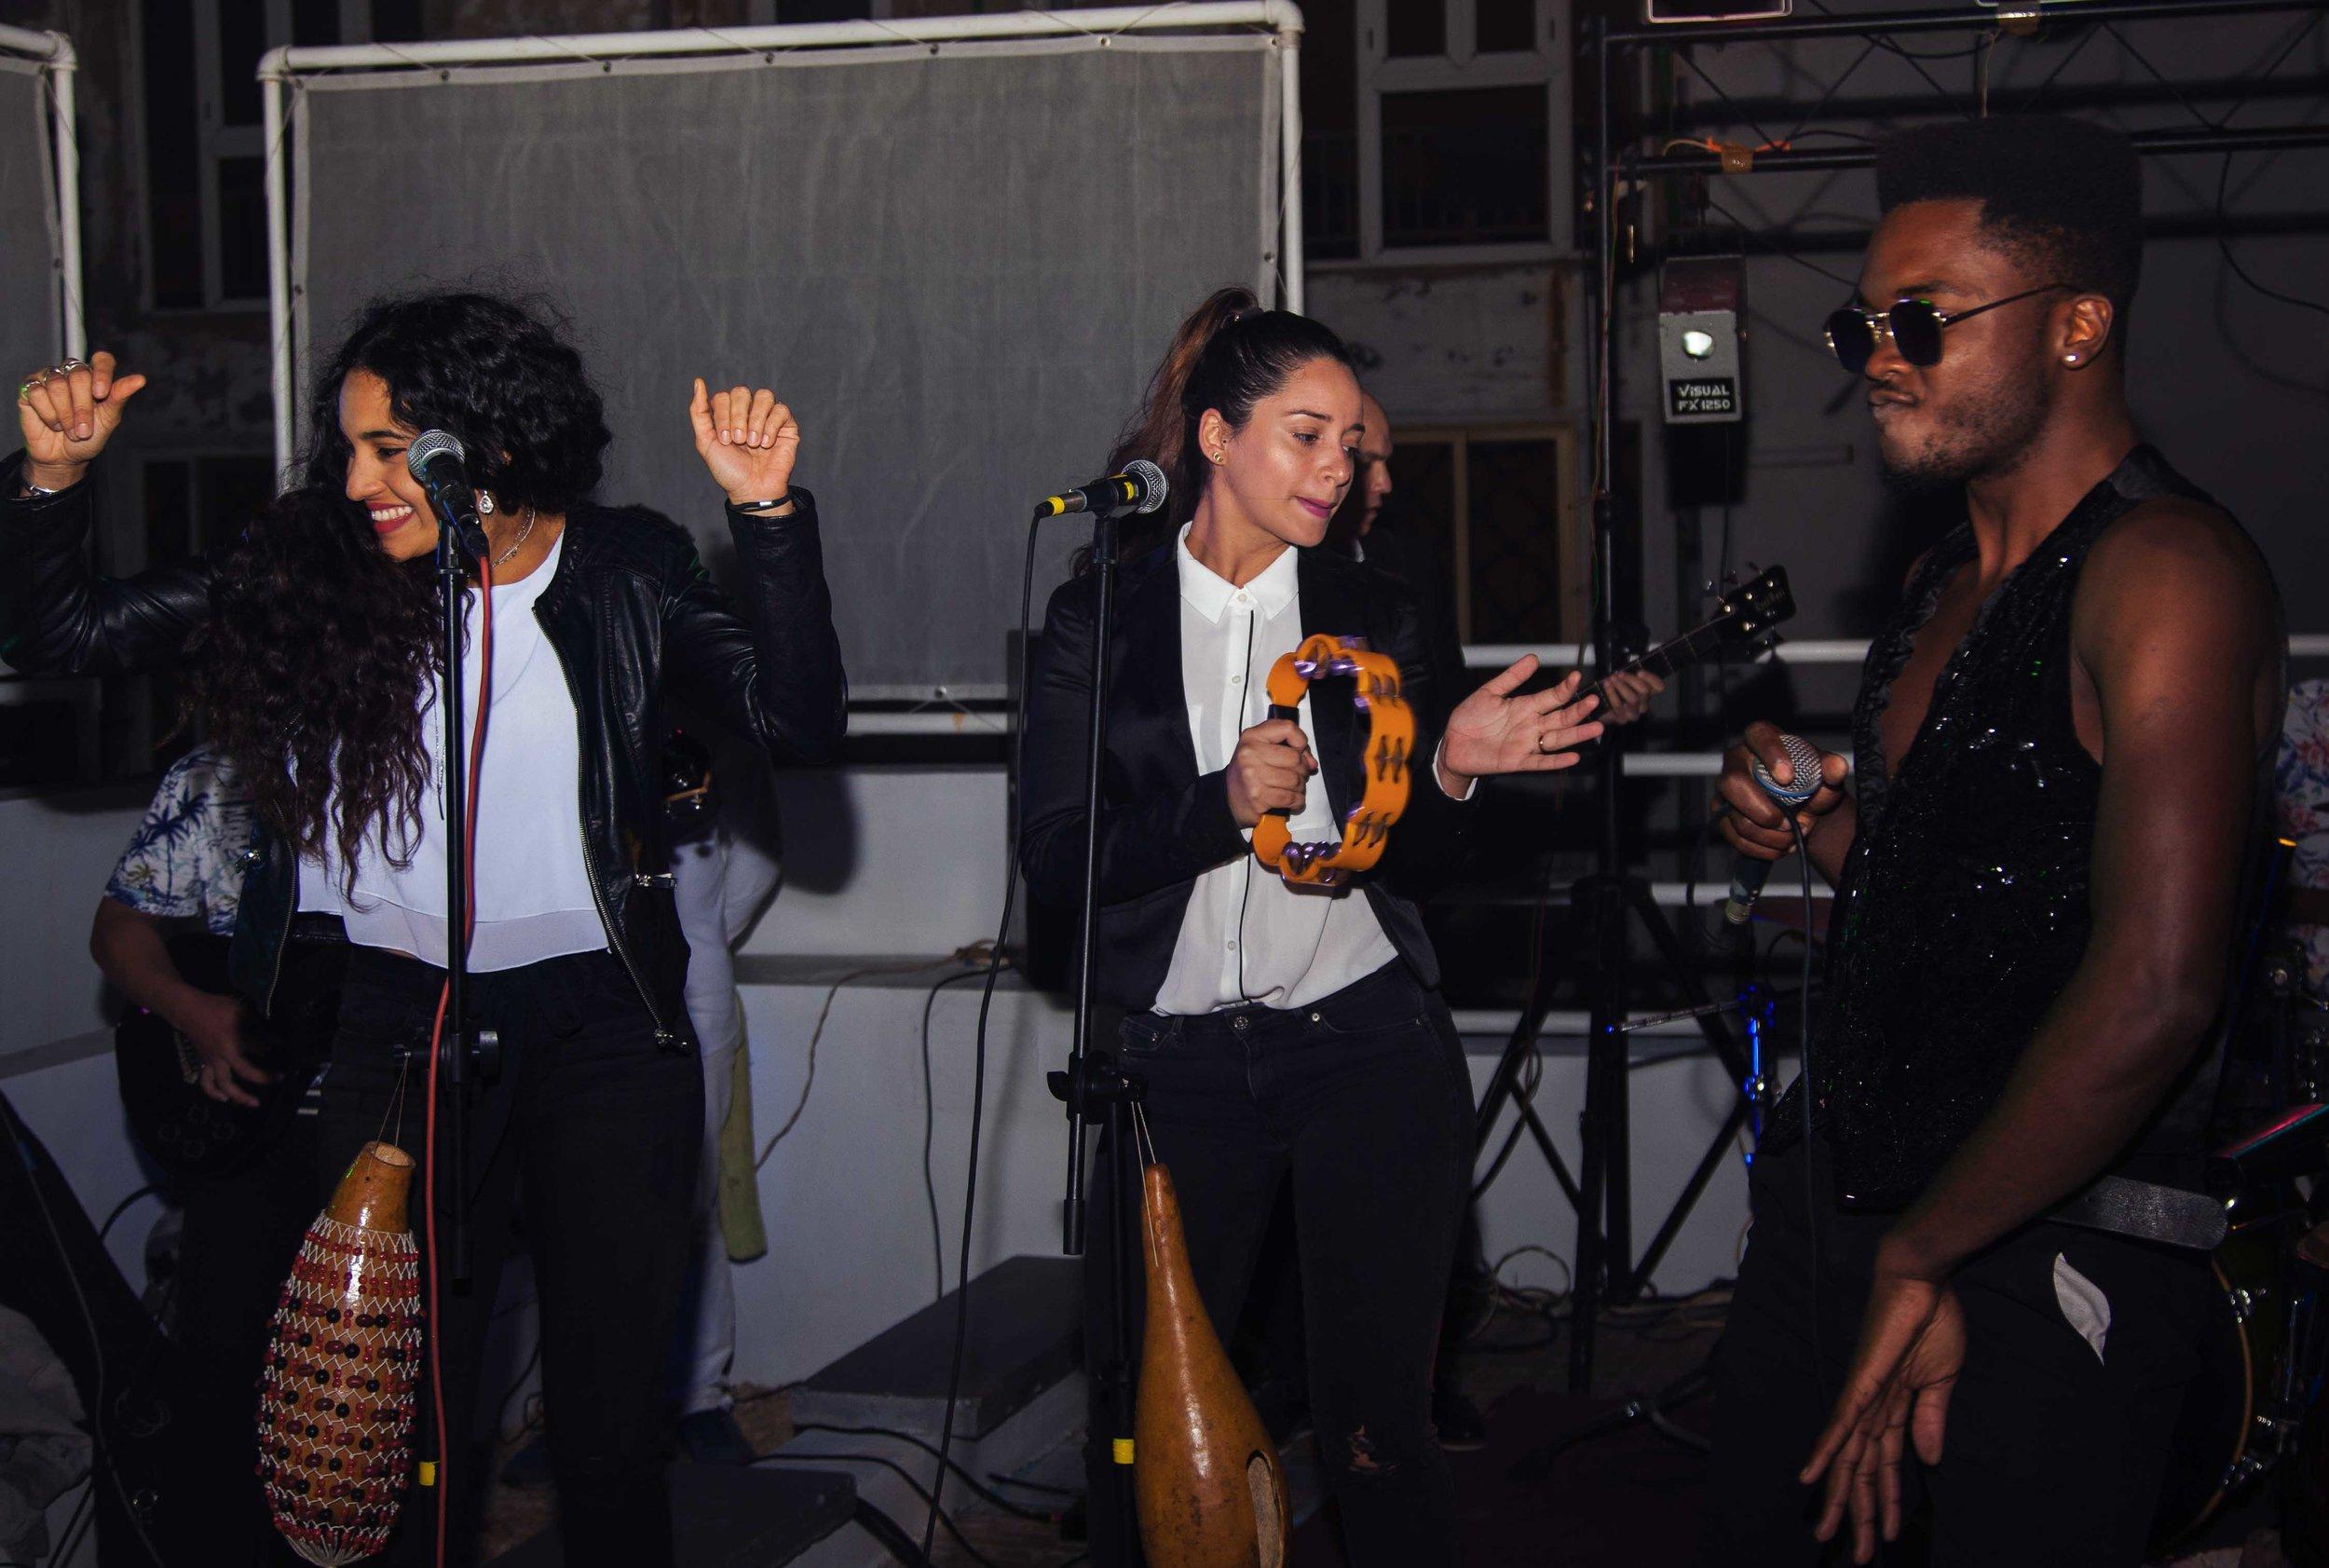 Cimafunk performs with backup singers Maria Carla Puga and Ariana Pimienta.